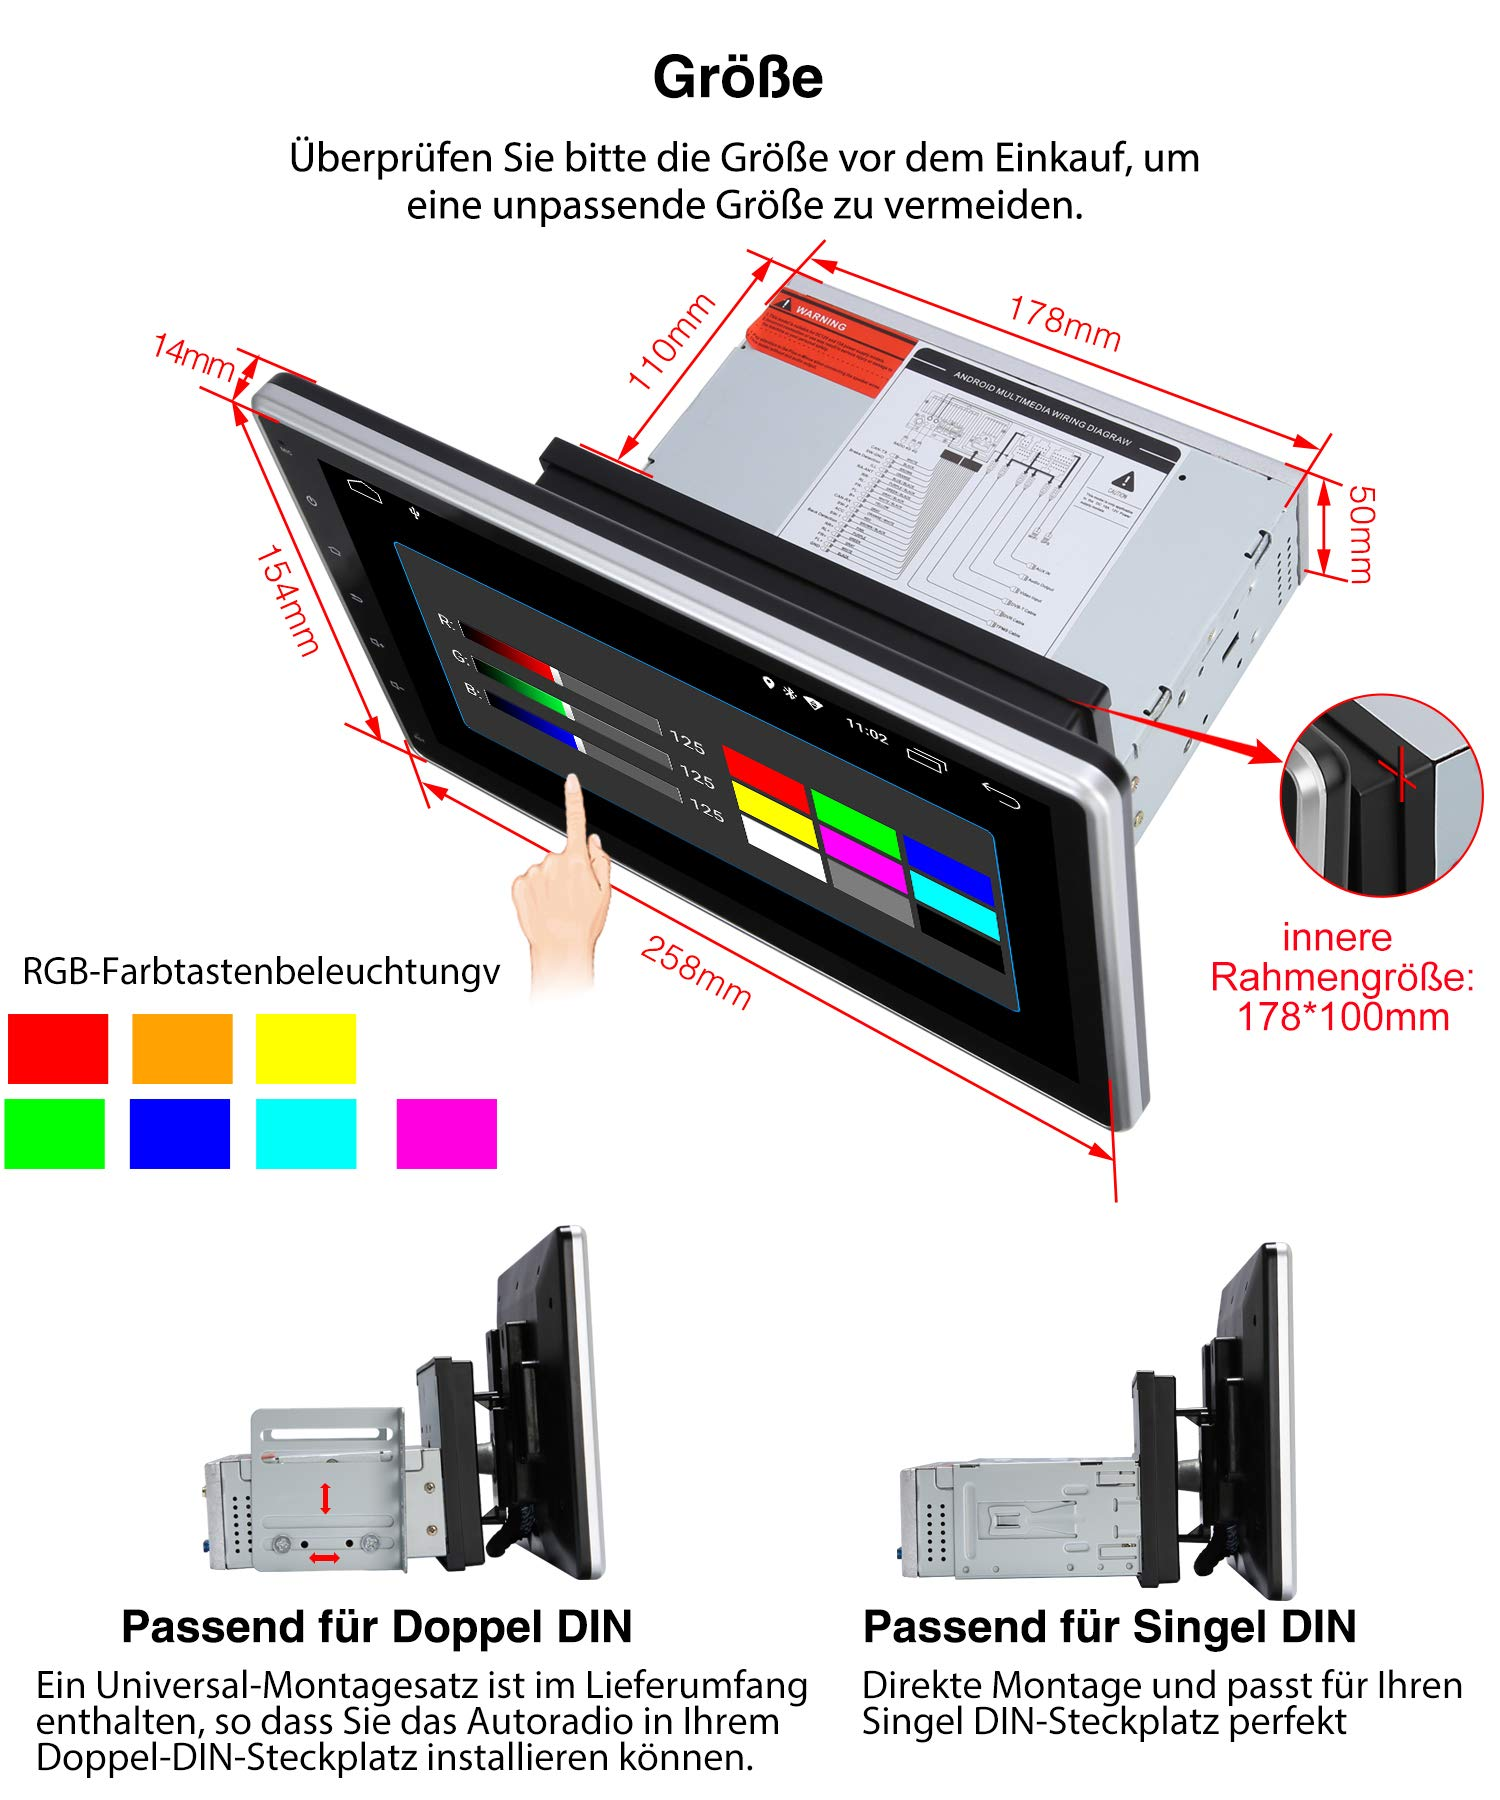 PUMPKIN-Android-81-Autoradio-Moniceiver-mit-Navi-101-Zoll-IPS-Bildschirm-Untersttzt-Bluetooth-DAB-USB-Android-Auto-WiFi-MicroSD-1-Din-2-Din-Universal